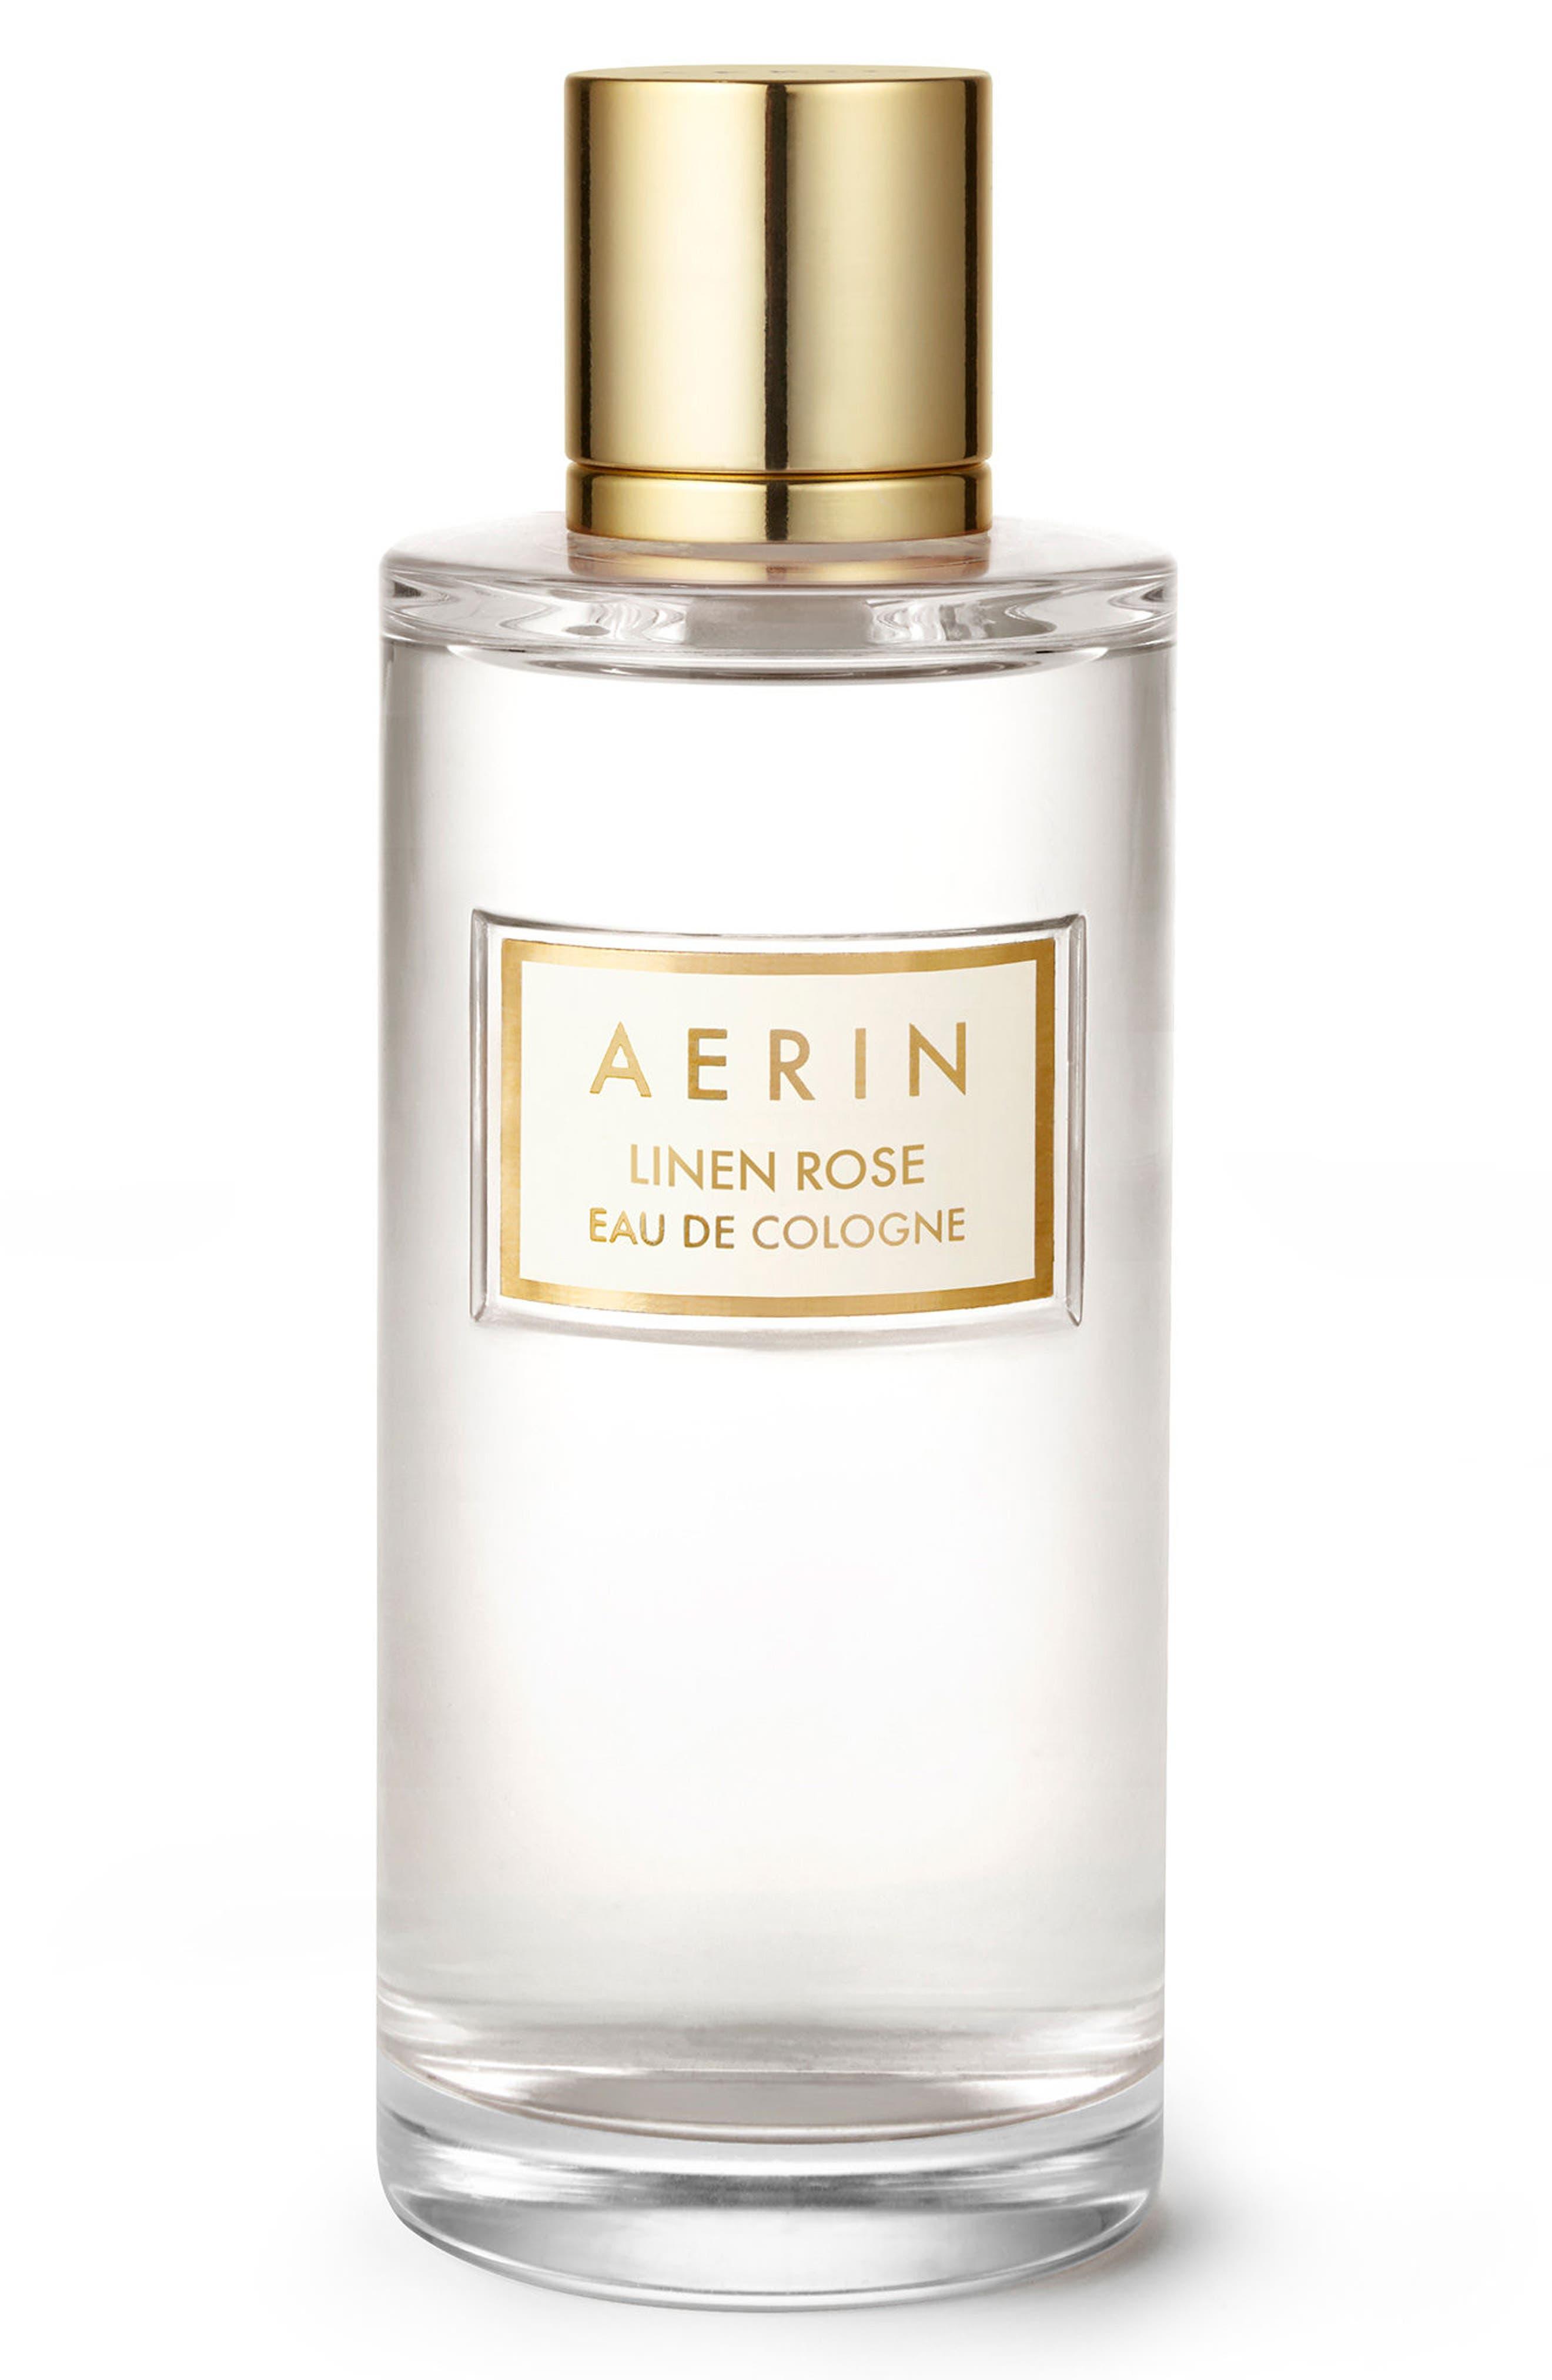 AERIN Beauty Linen Rose Eau de Cologne,                             Main thumbnail 1, color,                             000